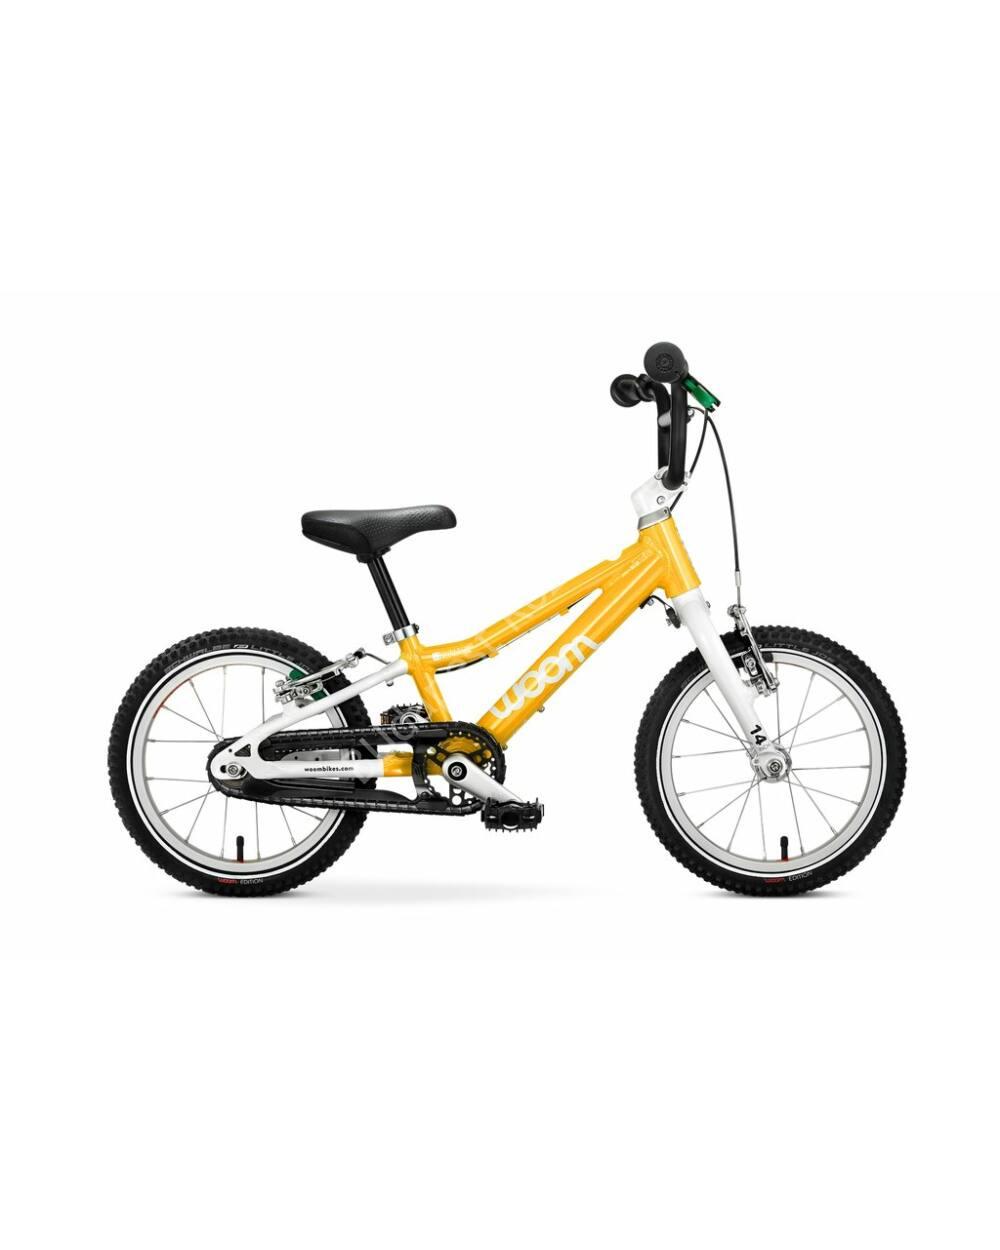 "Woom 2 sárga 14"" gyerek kerékpár, 95-110 cm testmagasság, 5.1 kg"